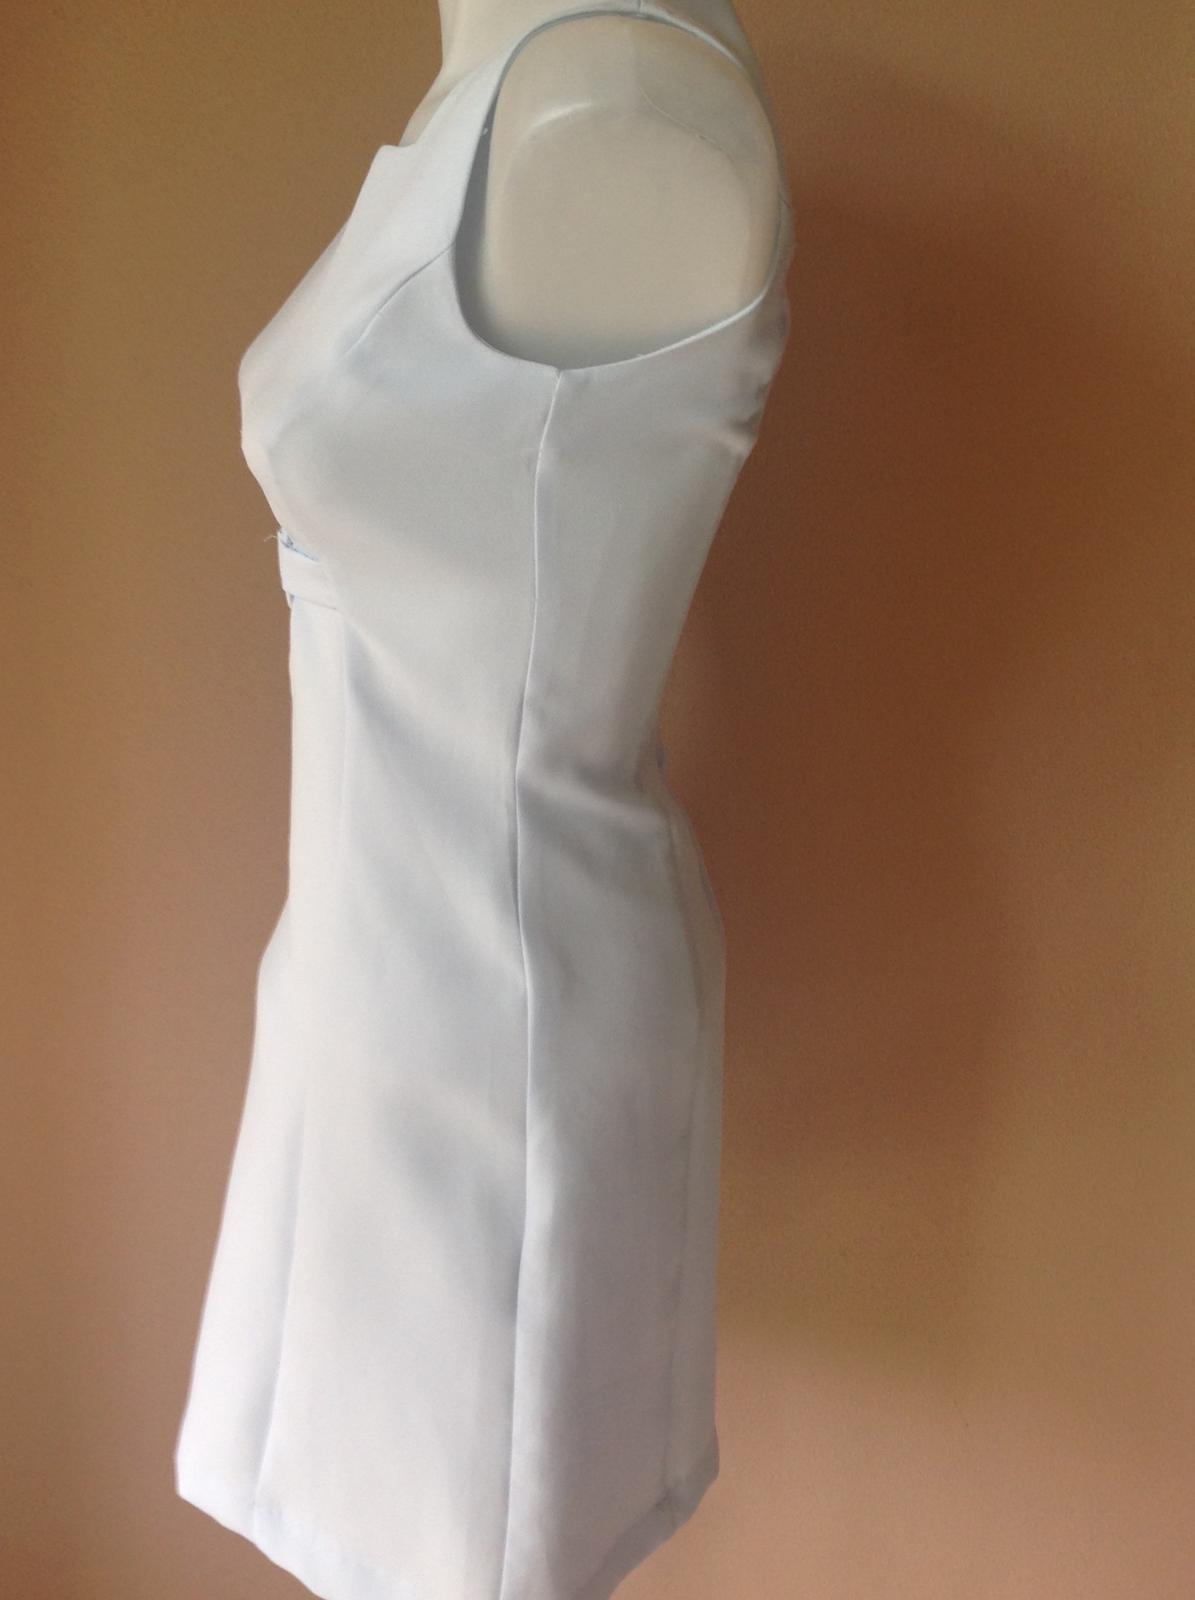 Šaty HENNES - Obrázok č. 2